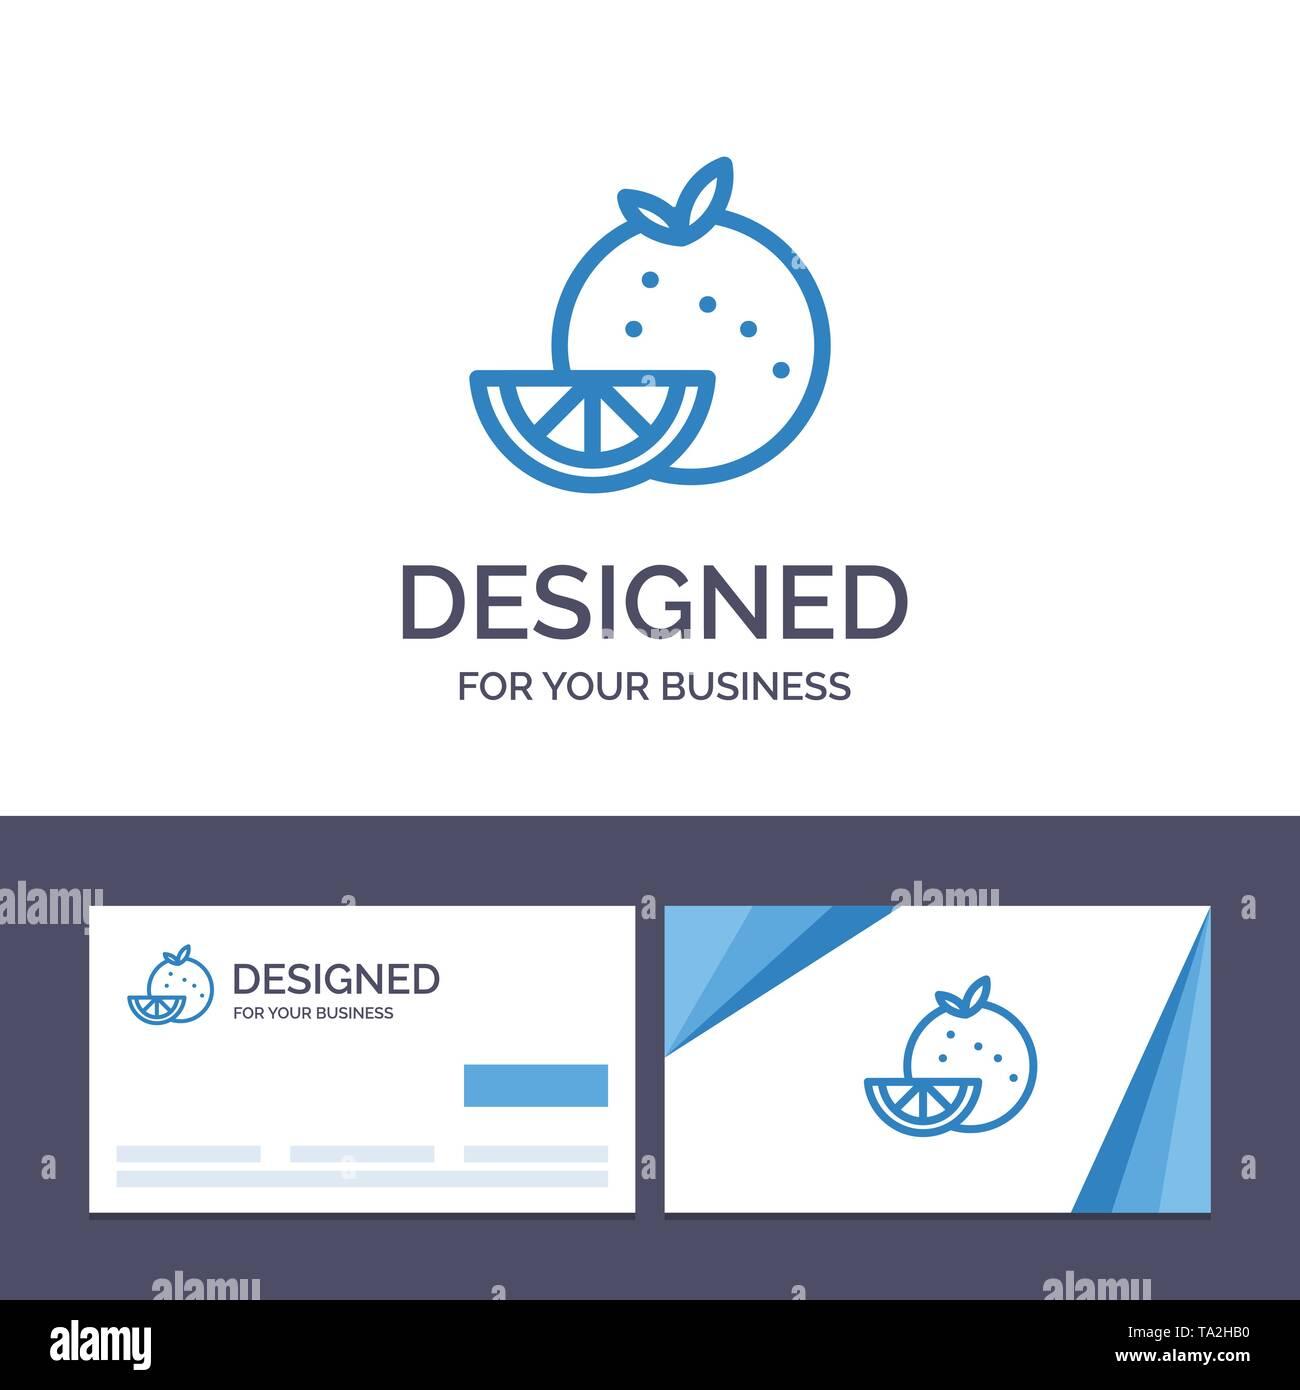 Creative Business Card and Logo template Orange, Food, Fruit, Madrigal Vector Illustration - Stock Image